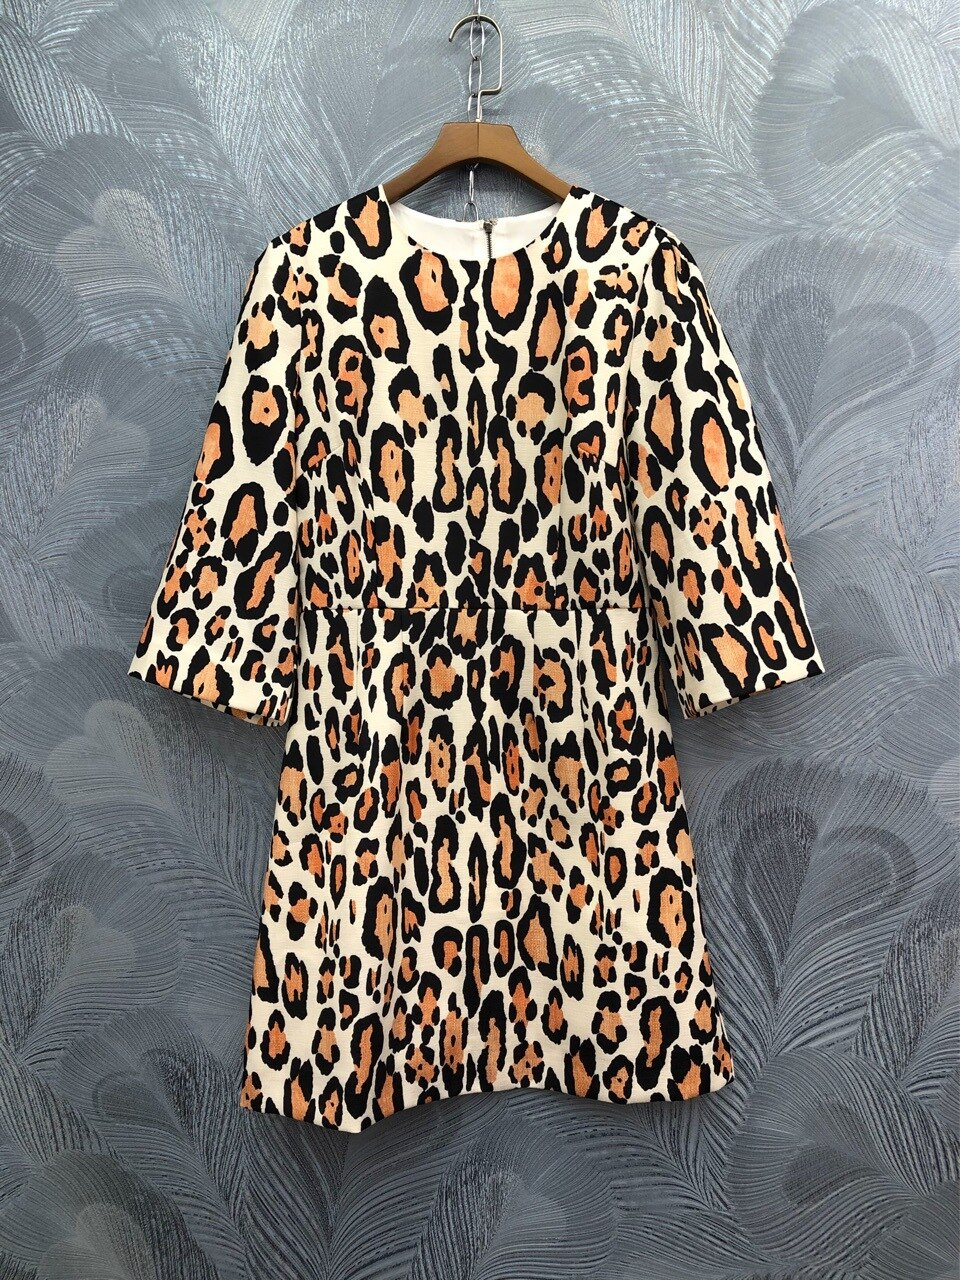 Europe&America women sexy leopard dress  spring summer runways half sleeve dress B236 1